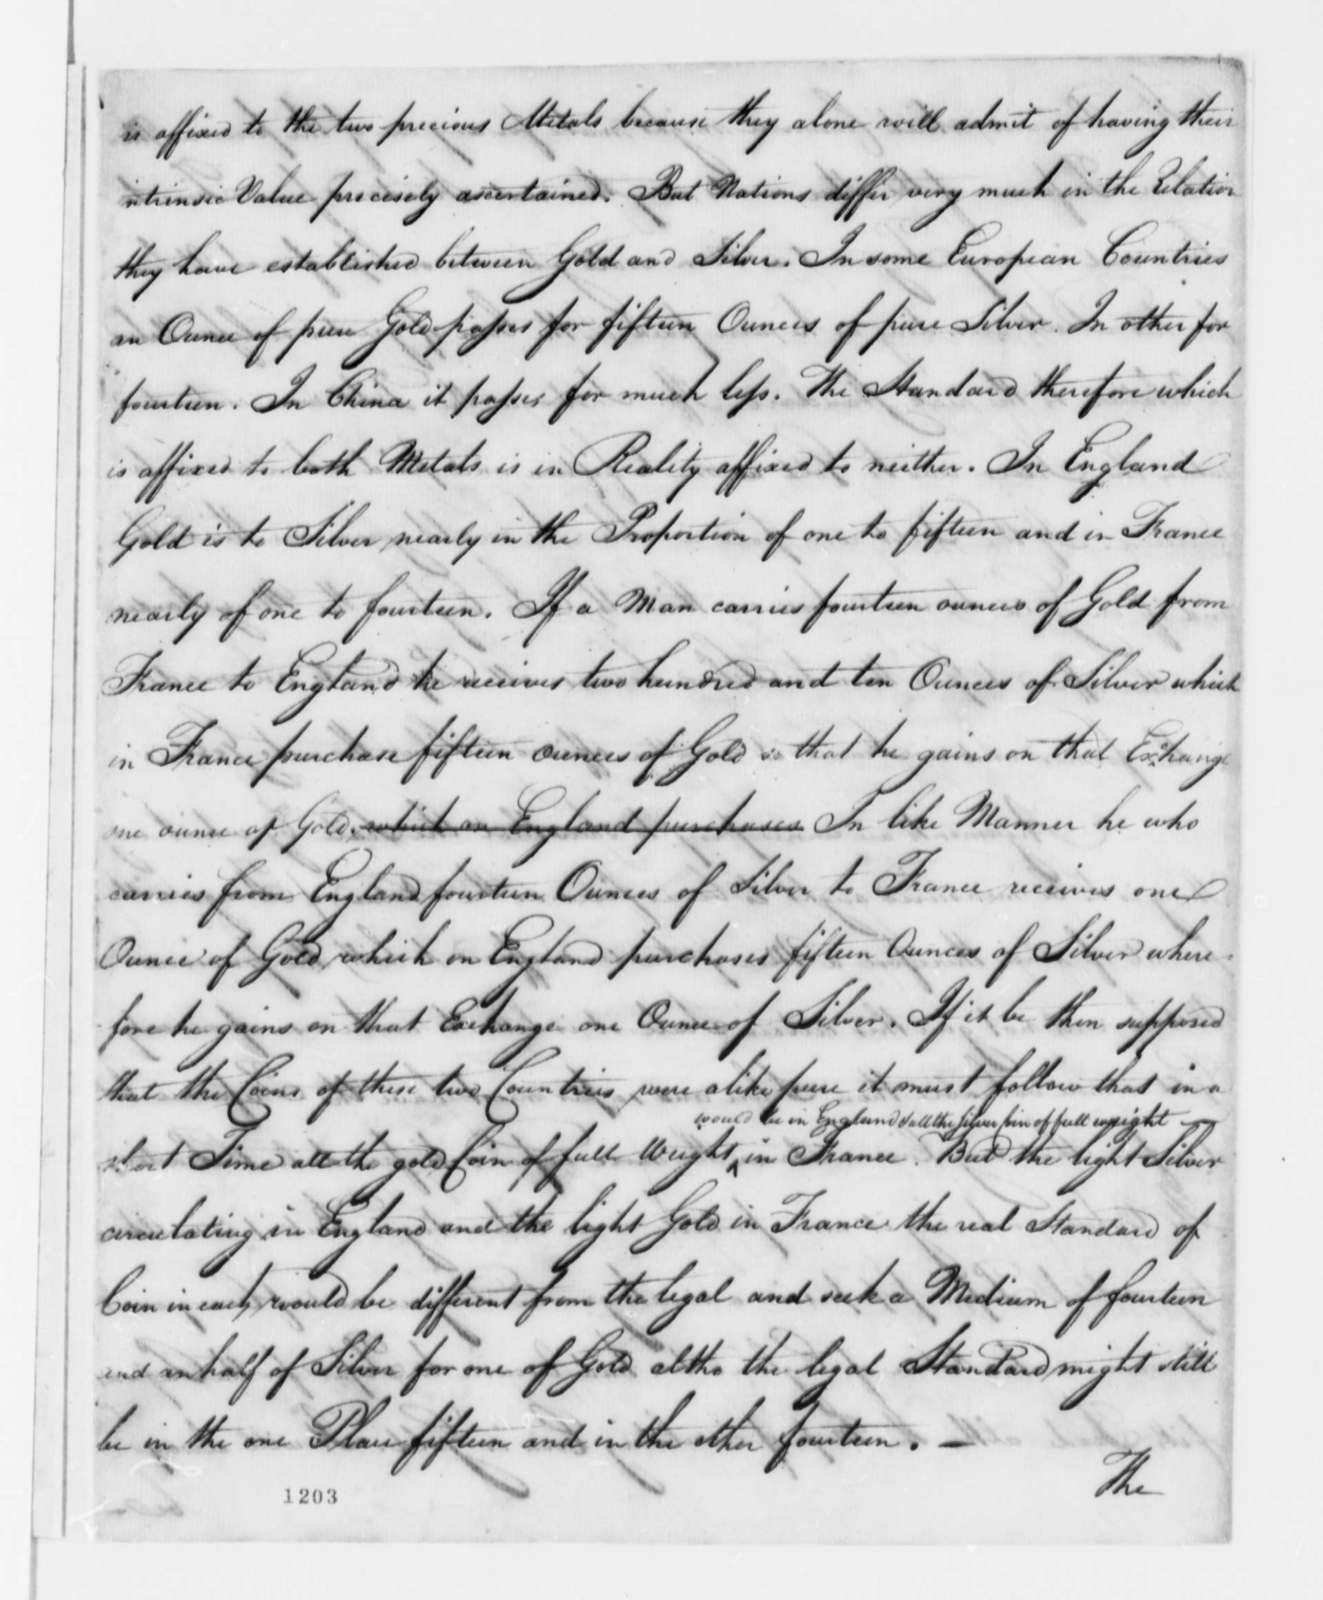 Robert Morris to John Hanson, January 15, 1782